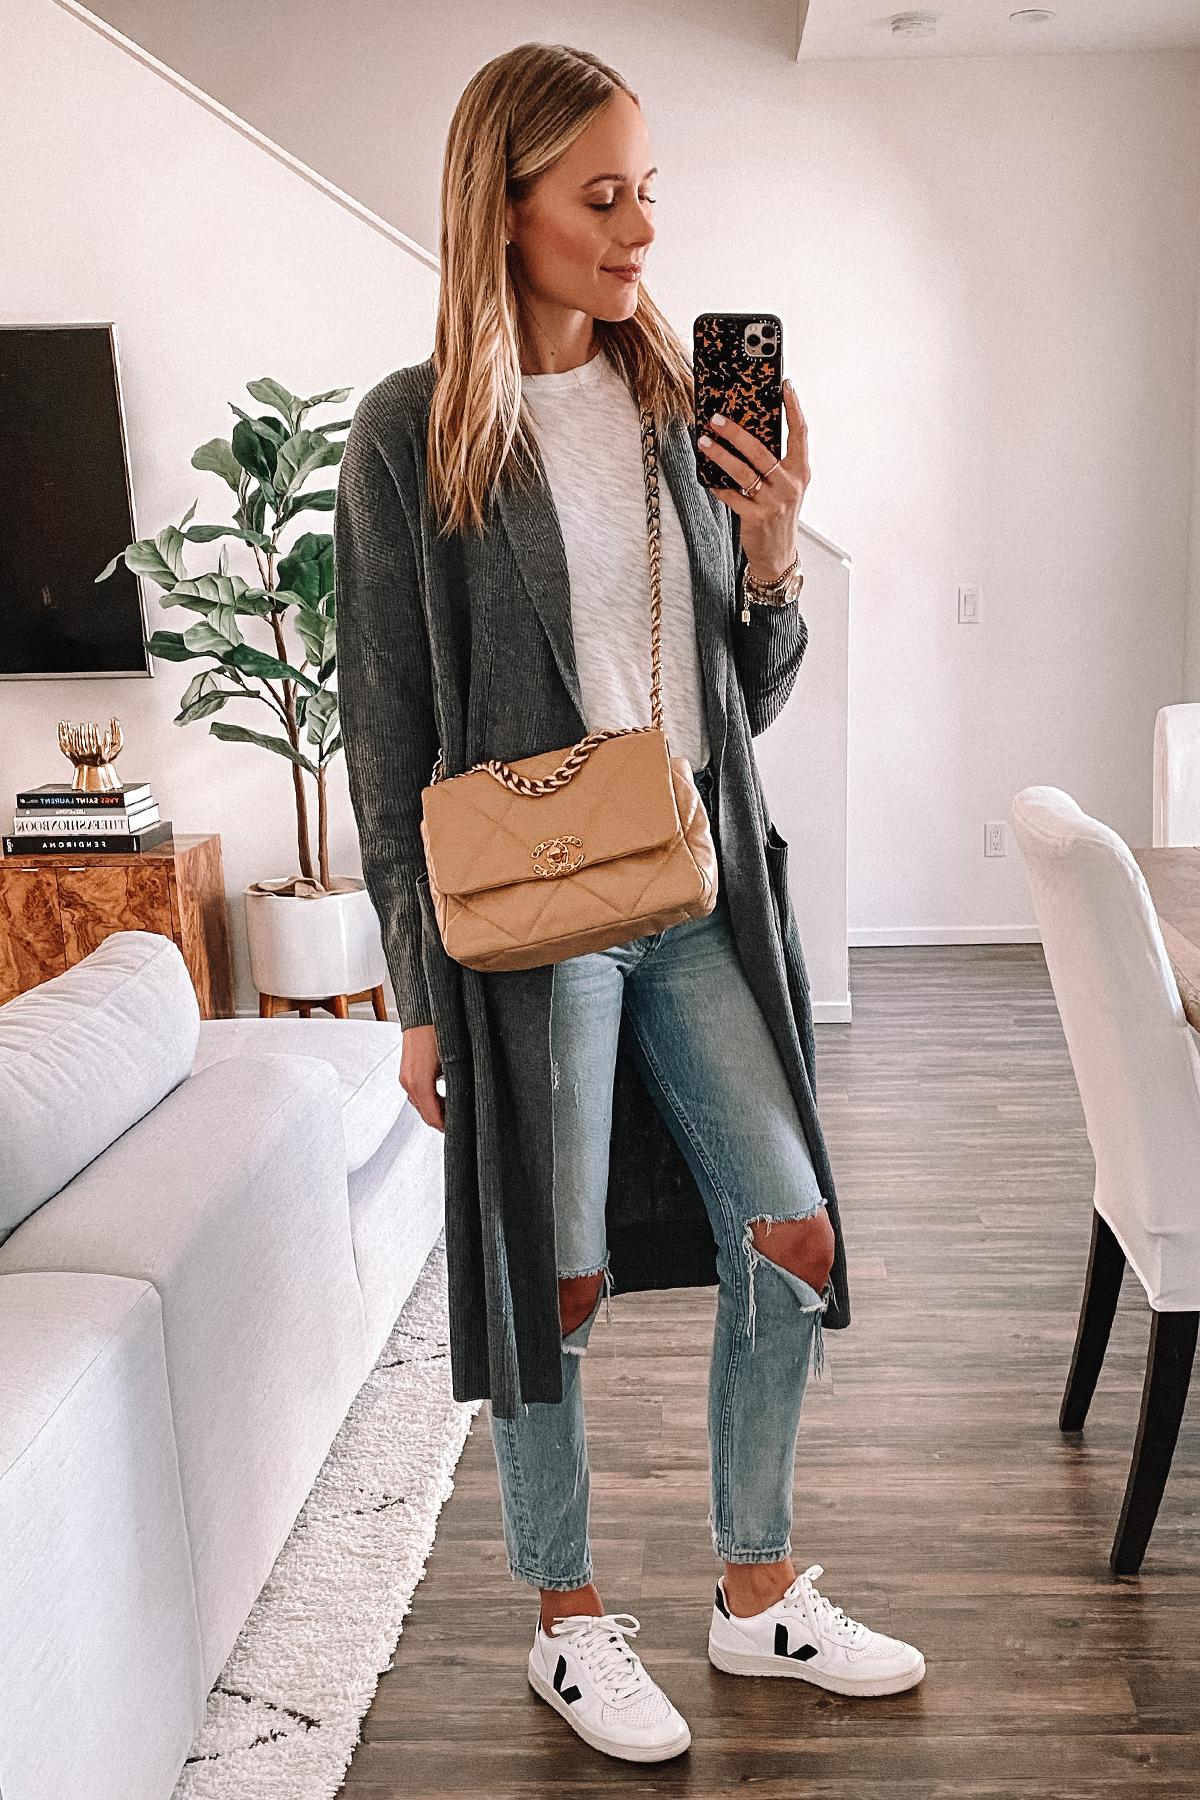 Fashion Jackson Wearing Amazon Sweater Long Grey Cardigan Ripped Jeans Veja Sneakers